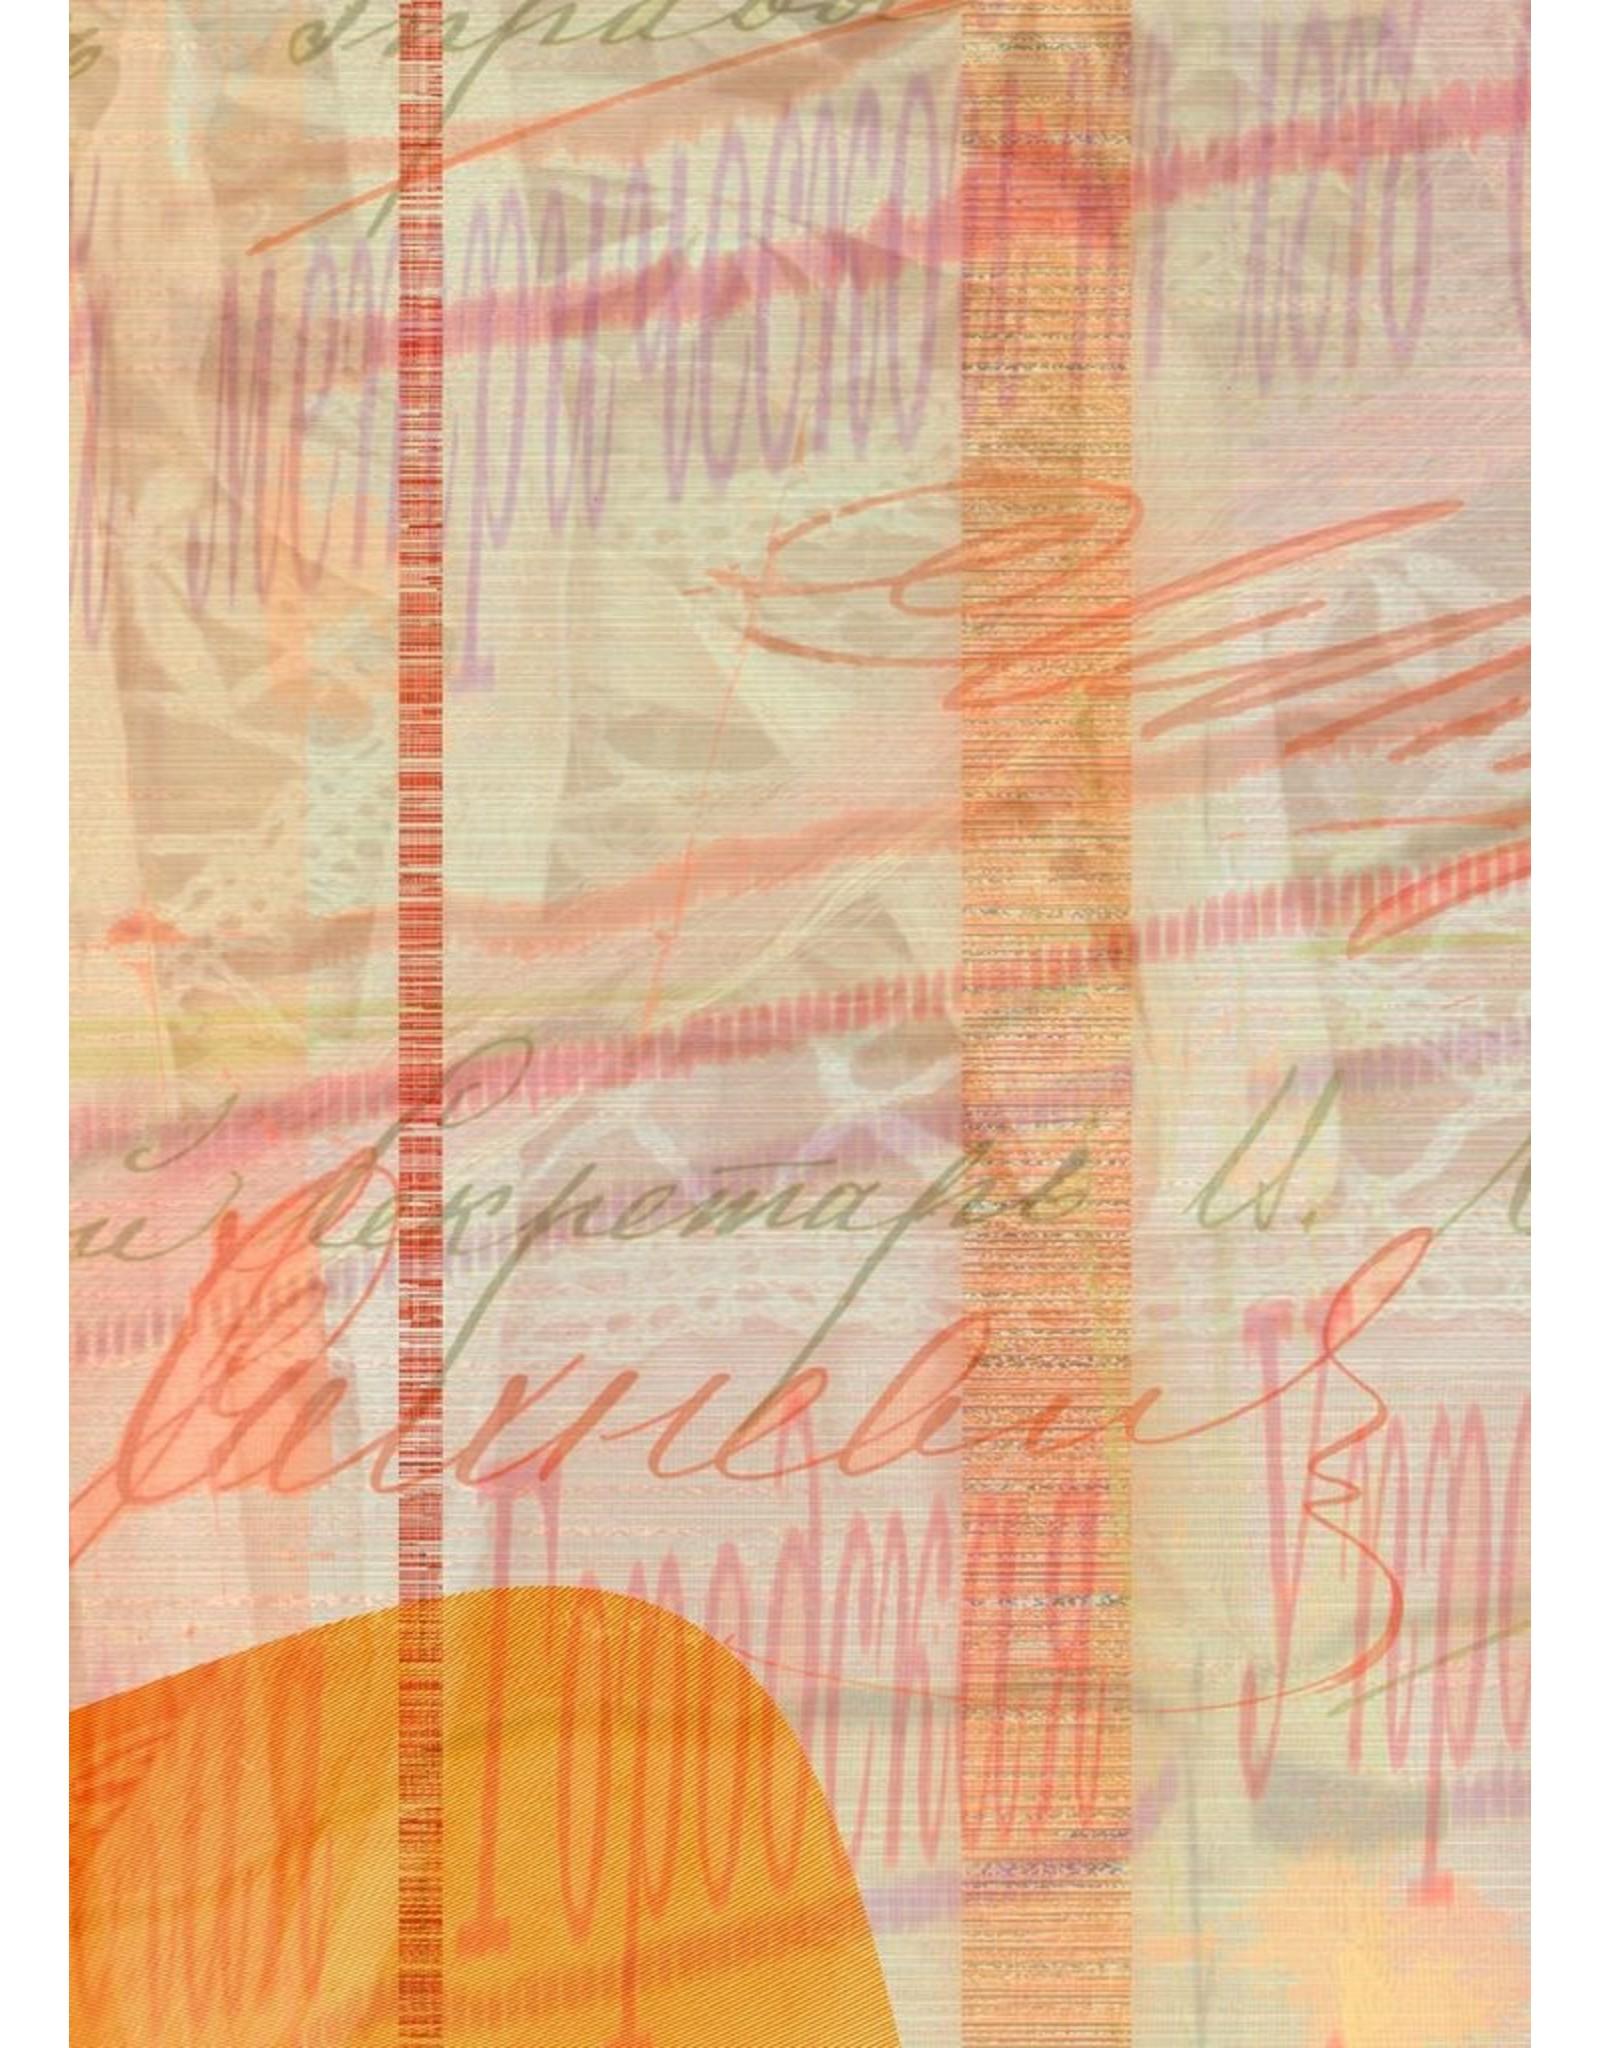 Turner, Susan untitled (orange), Susan Turner